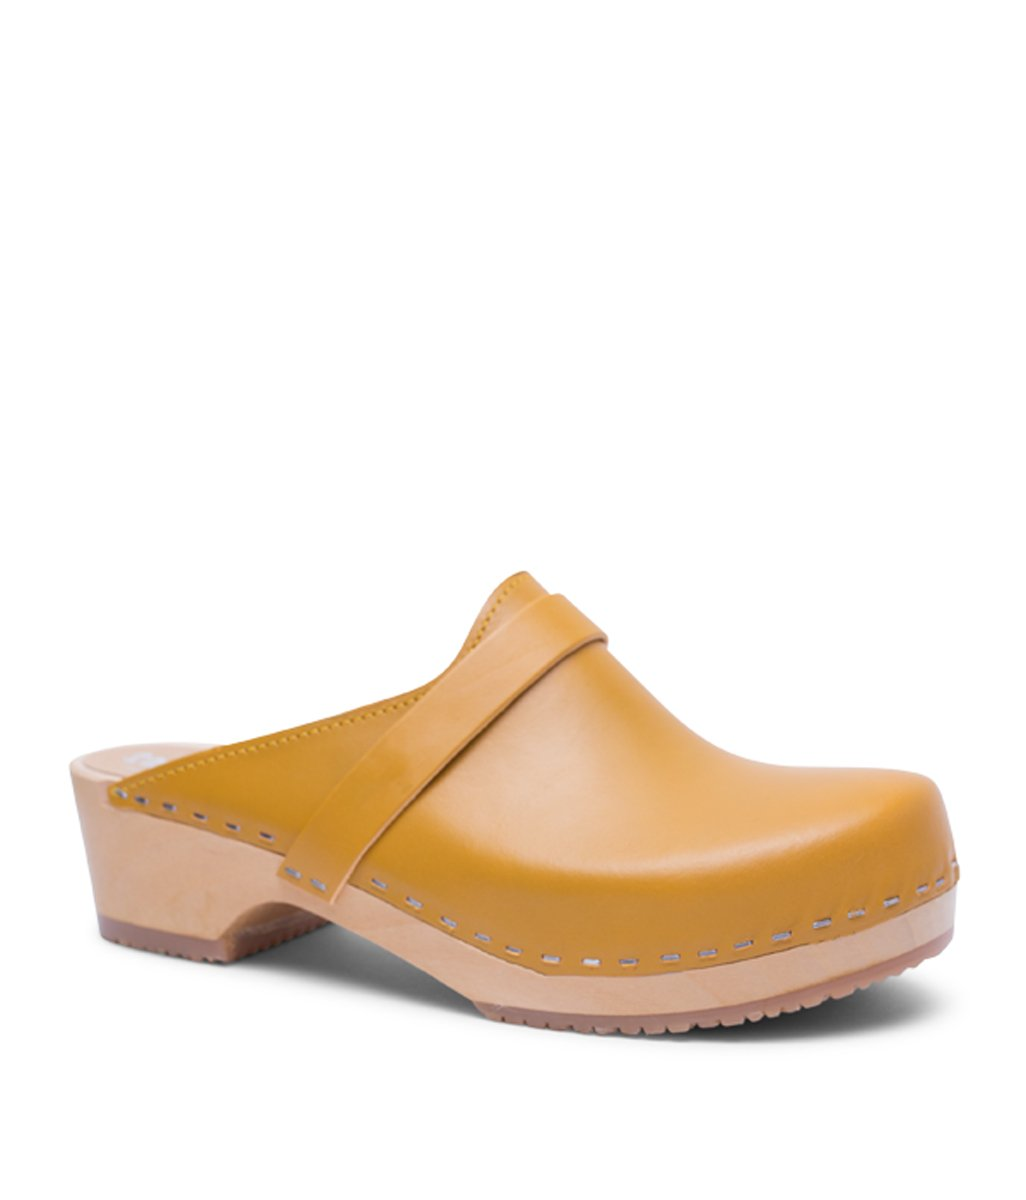 Sandgrens Swedish Low Heel Wooden Clog Mules For Women   Tokyo In Mustard by, Size US 7 EU 37